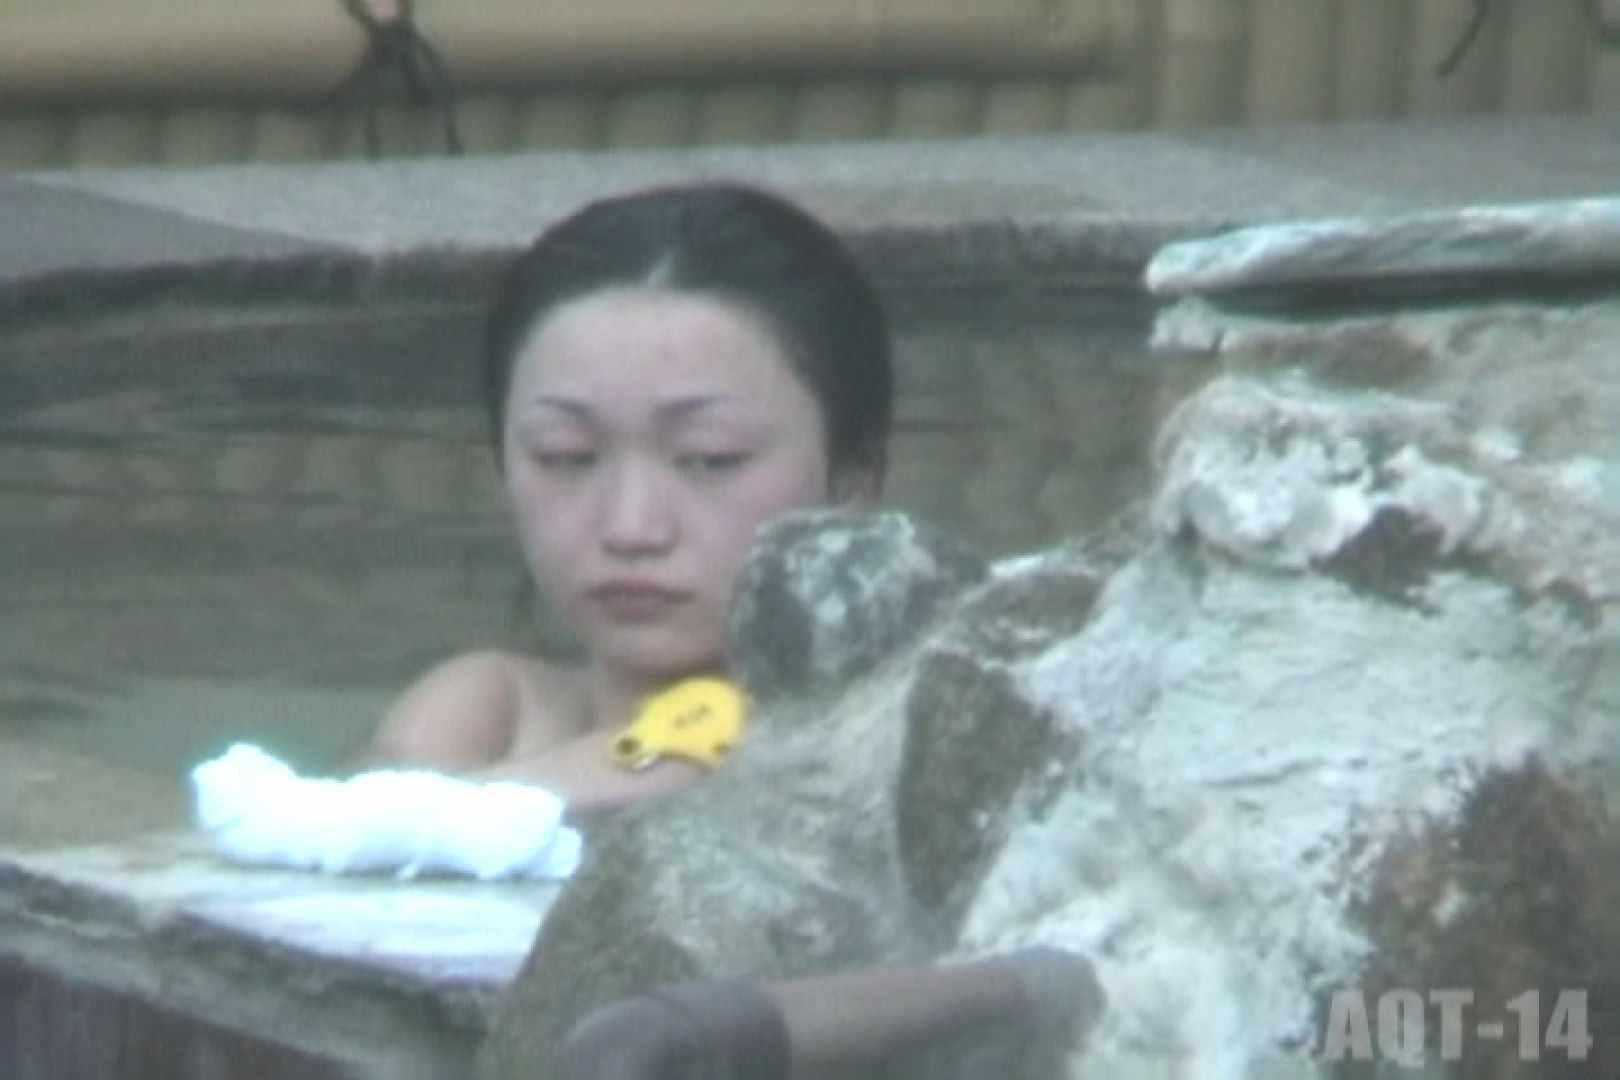 Aquaな露天風呂Vol.826 盗撮 | OLエロ画像  88PICs 10